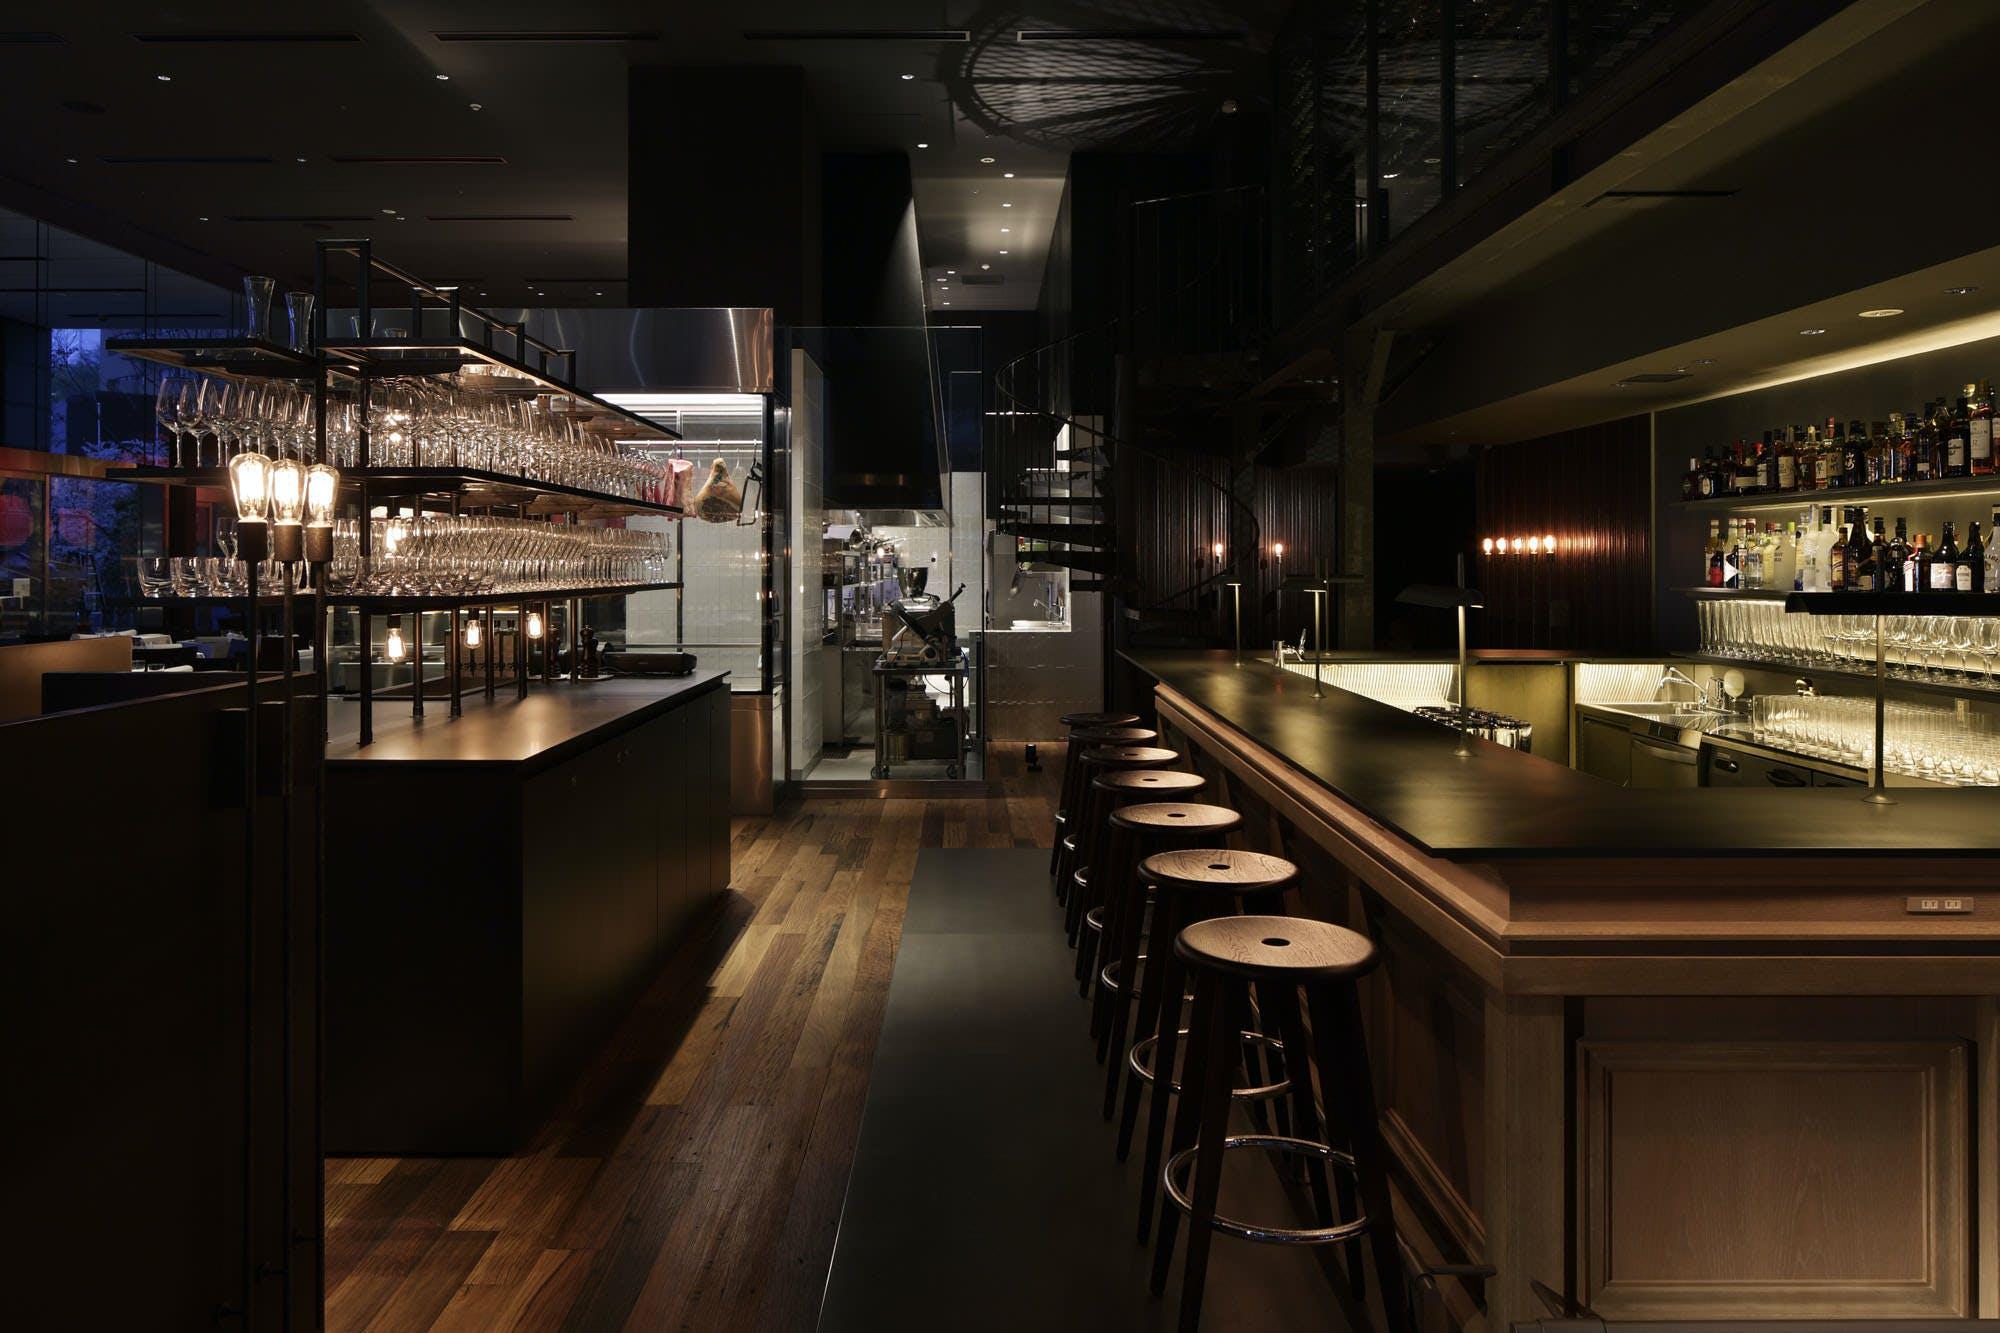 Ruby Jack's Steakhouse & Bar